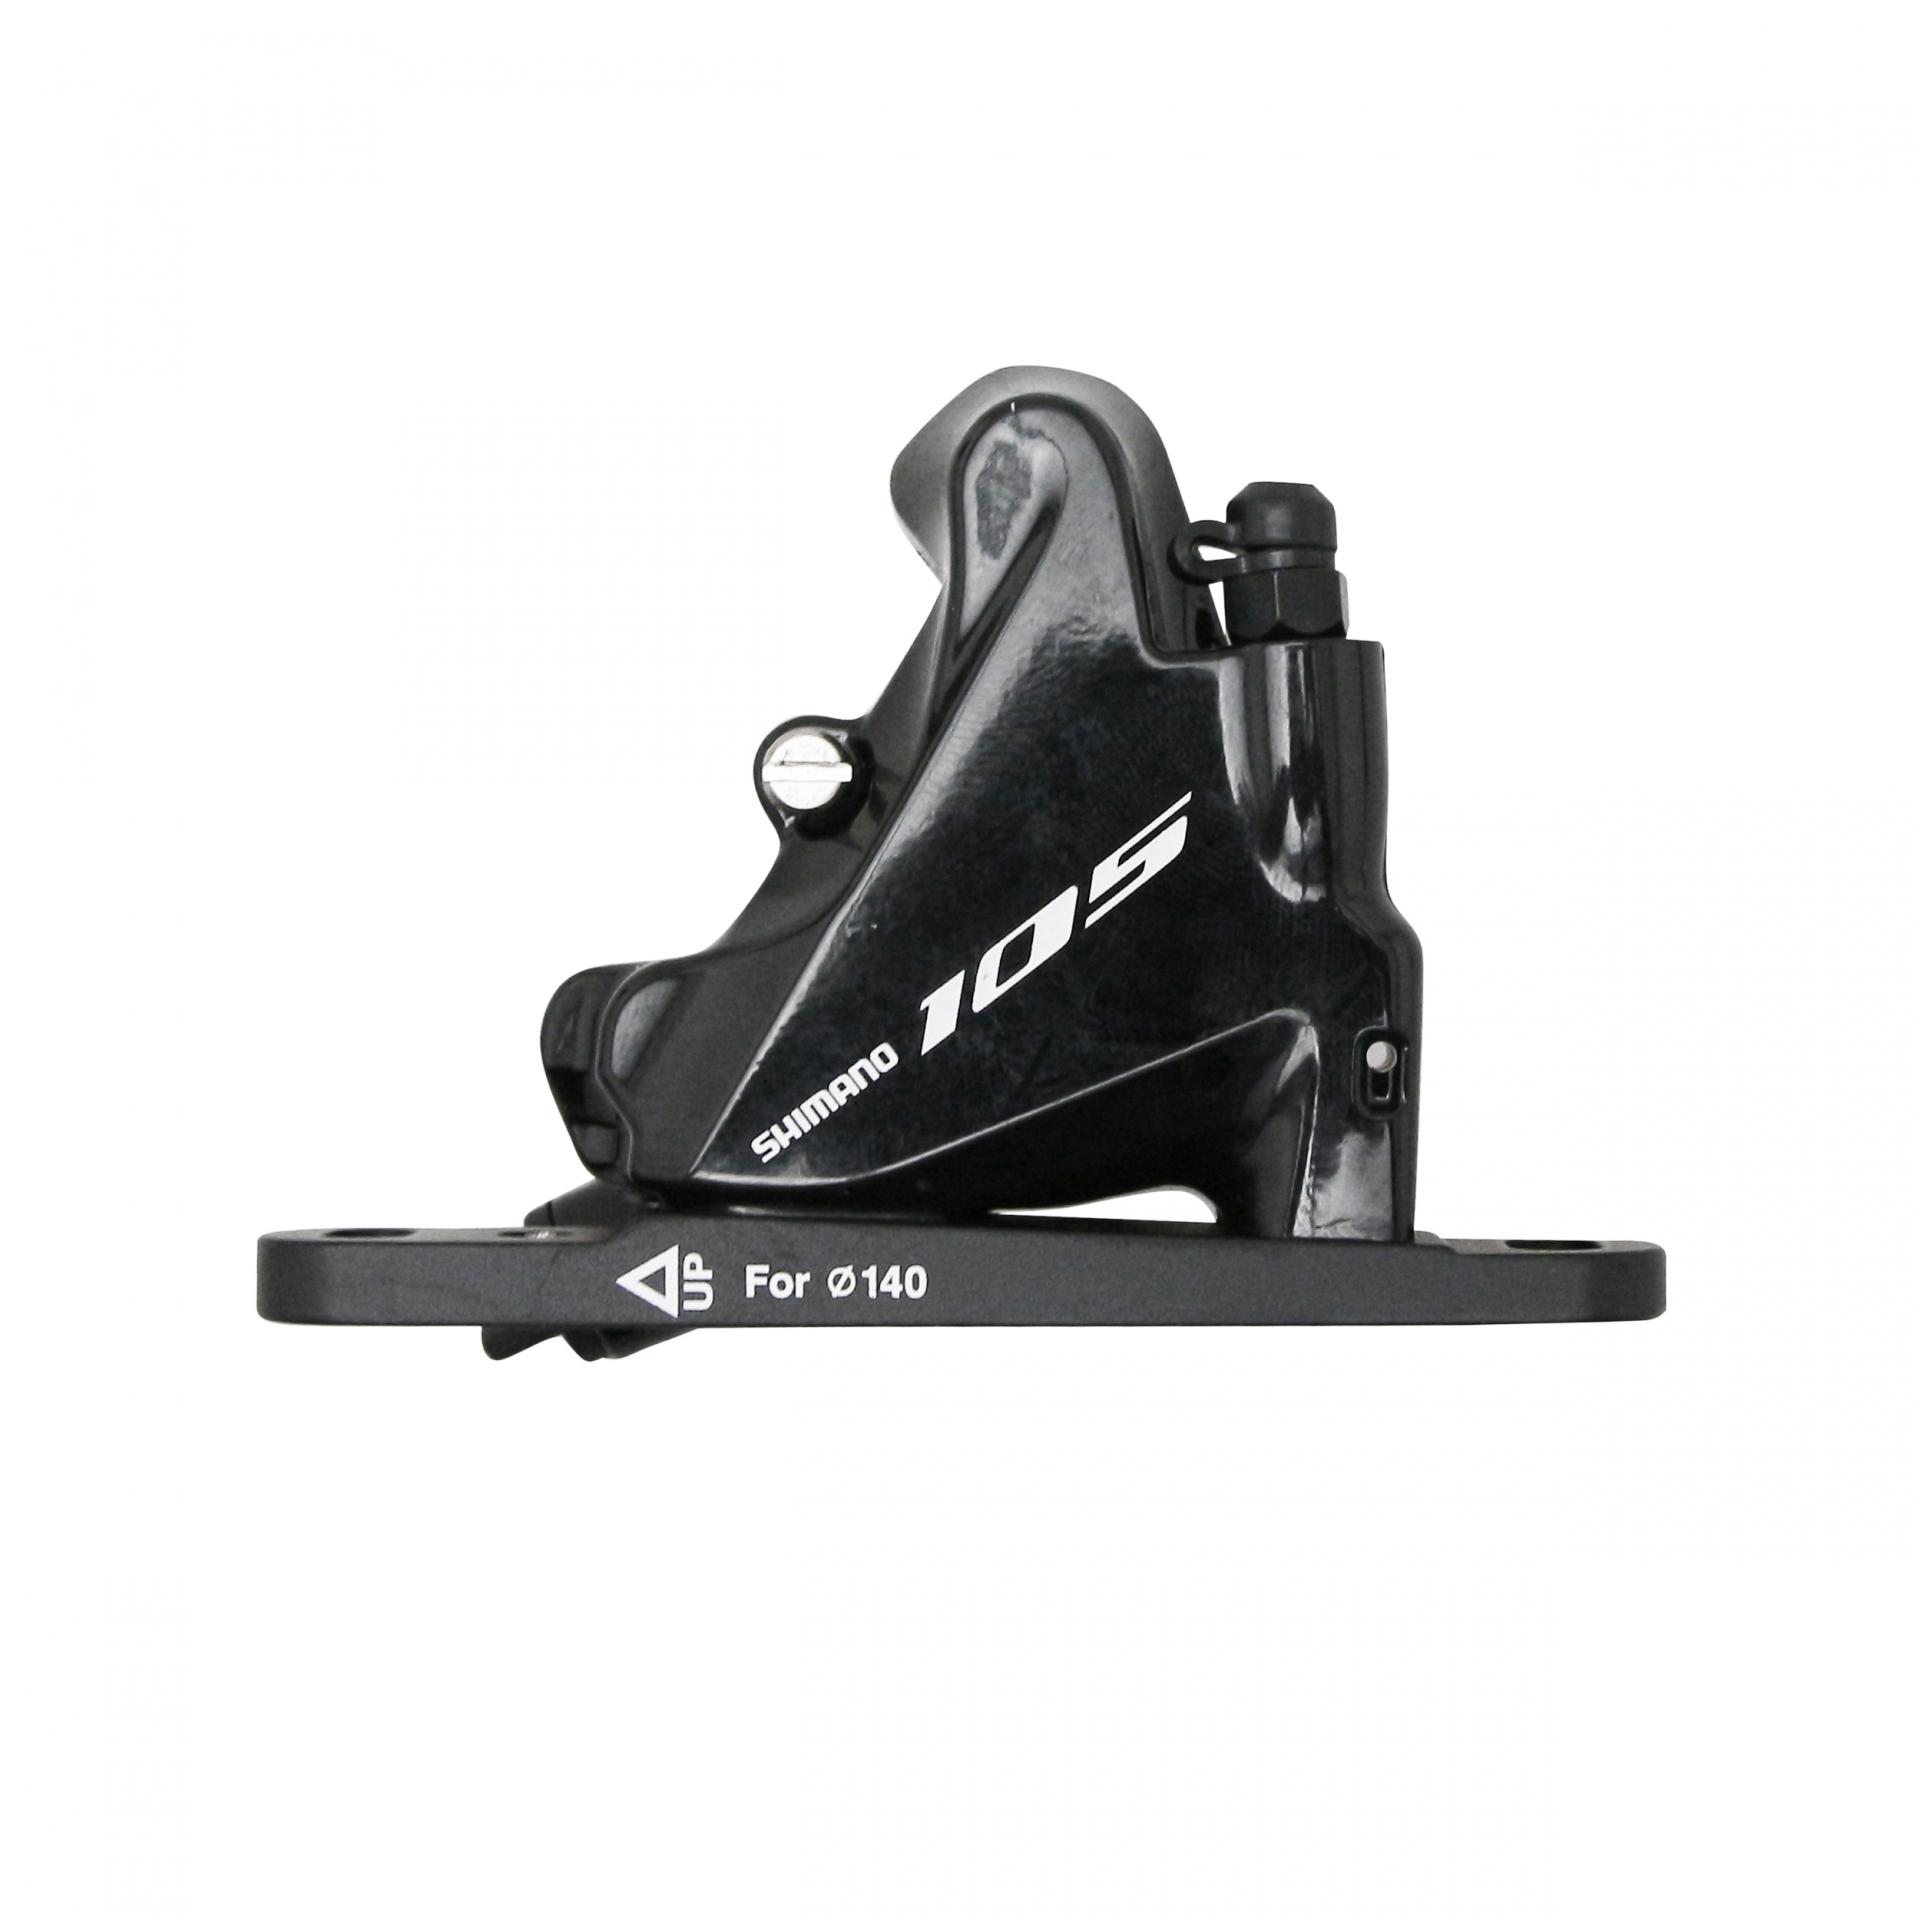 Étrier de frein AV route Shimano Disc 105 R7070 Flat Mount Noir